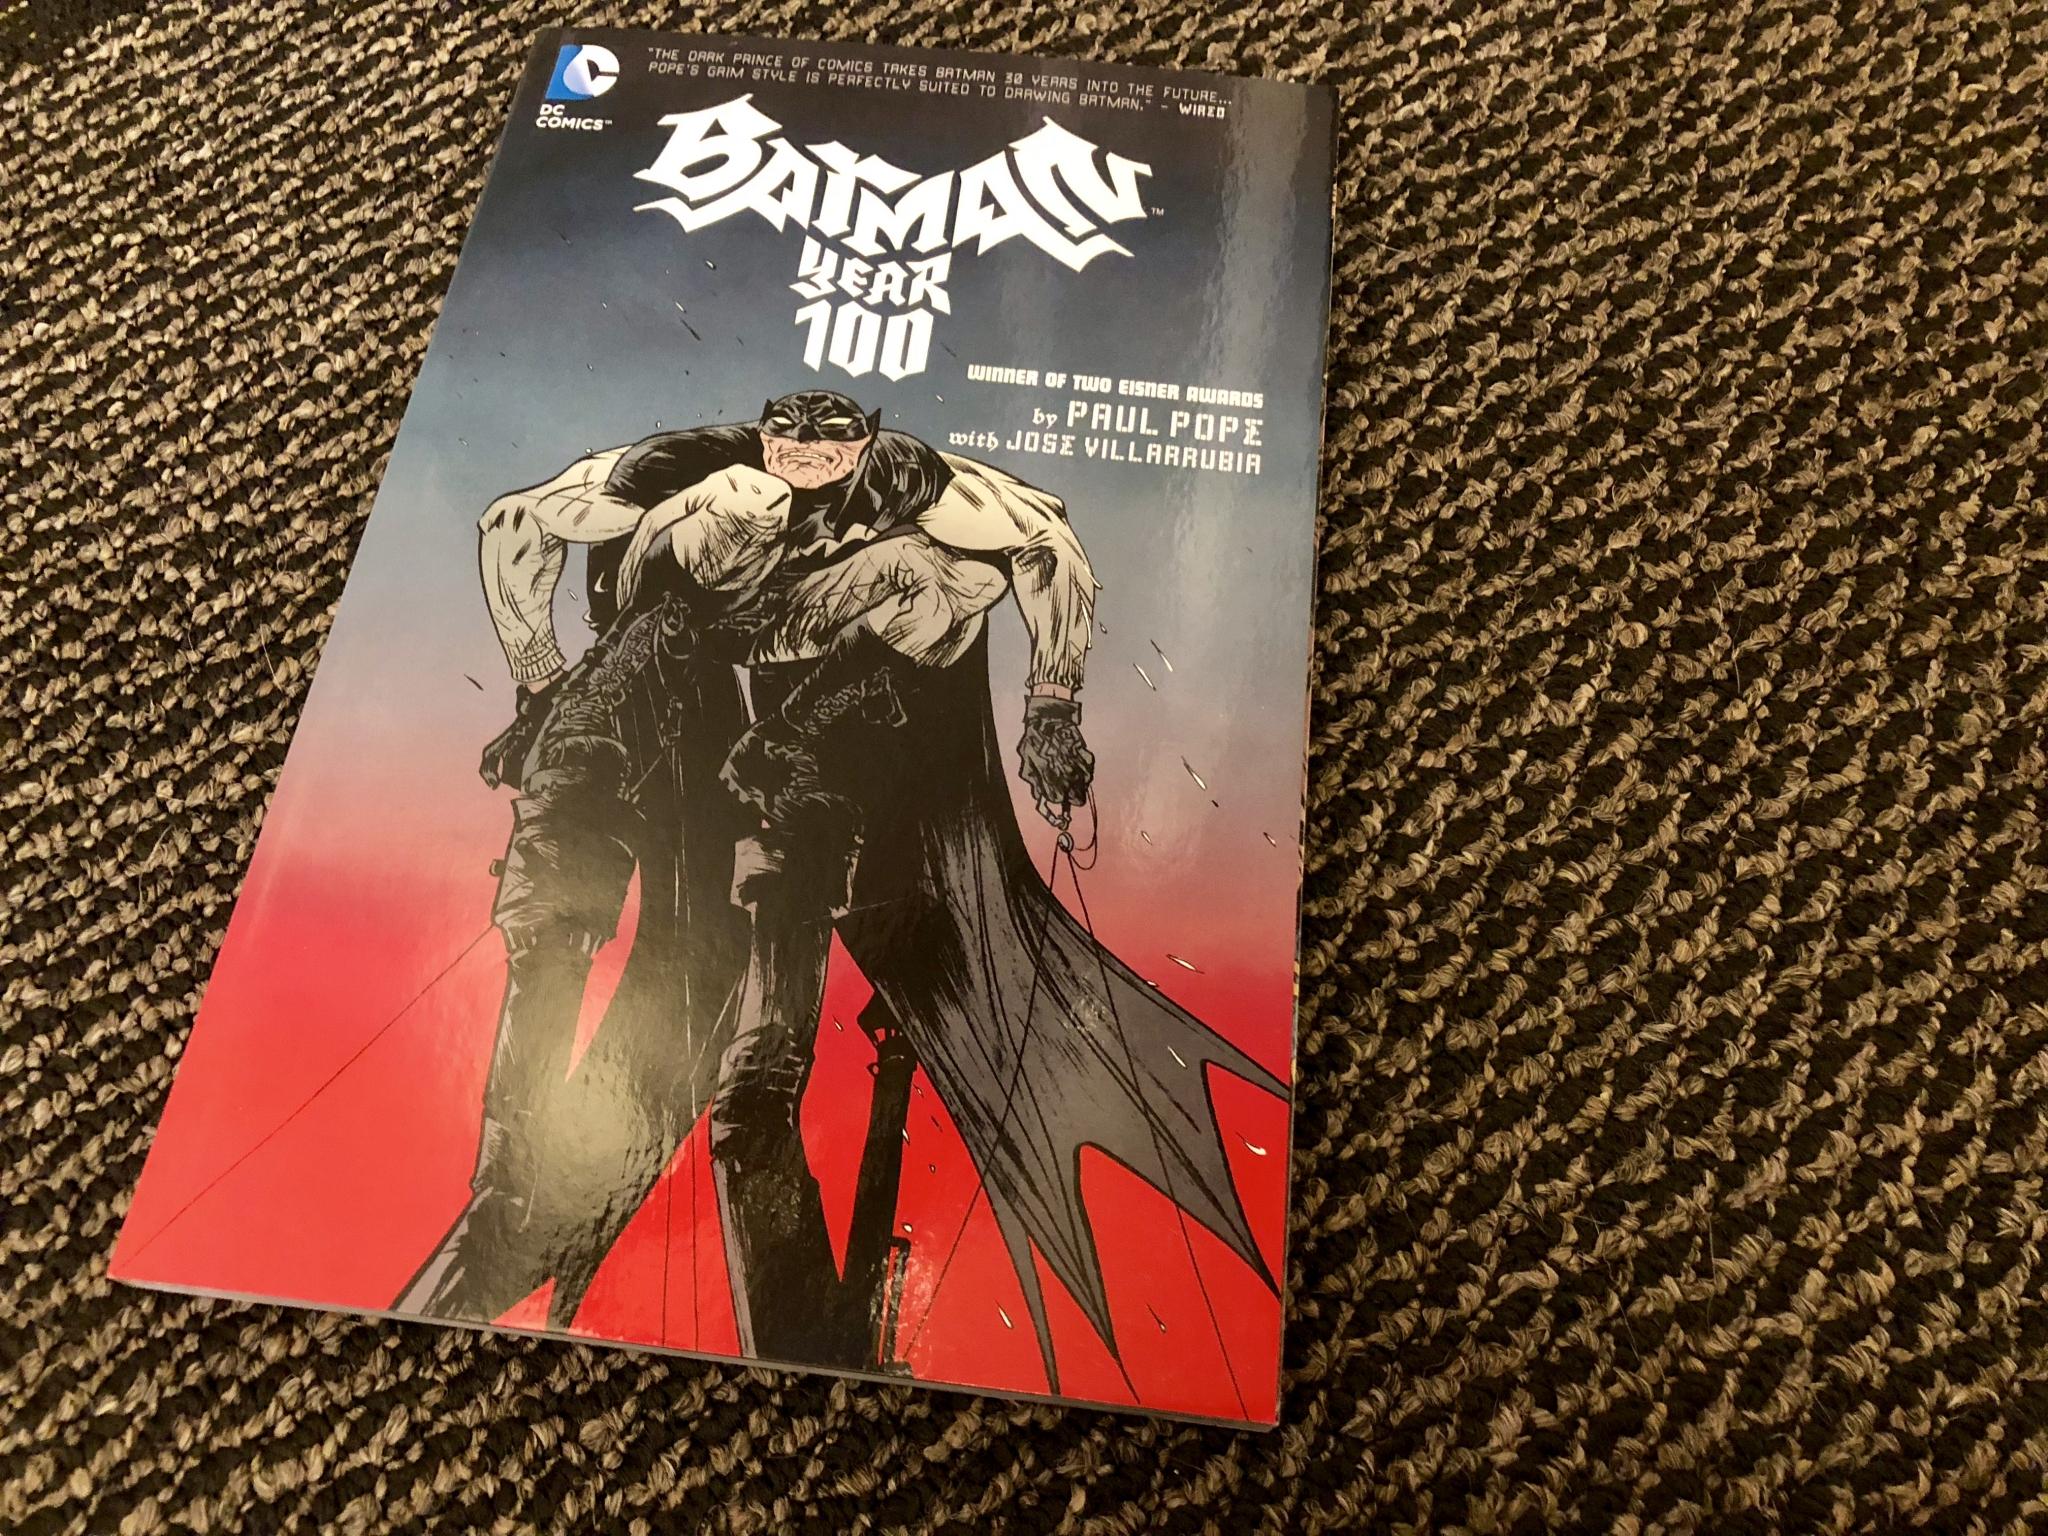 Batman Year 1000